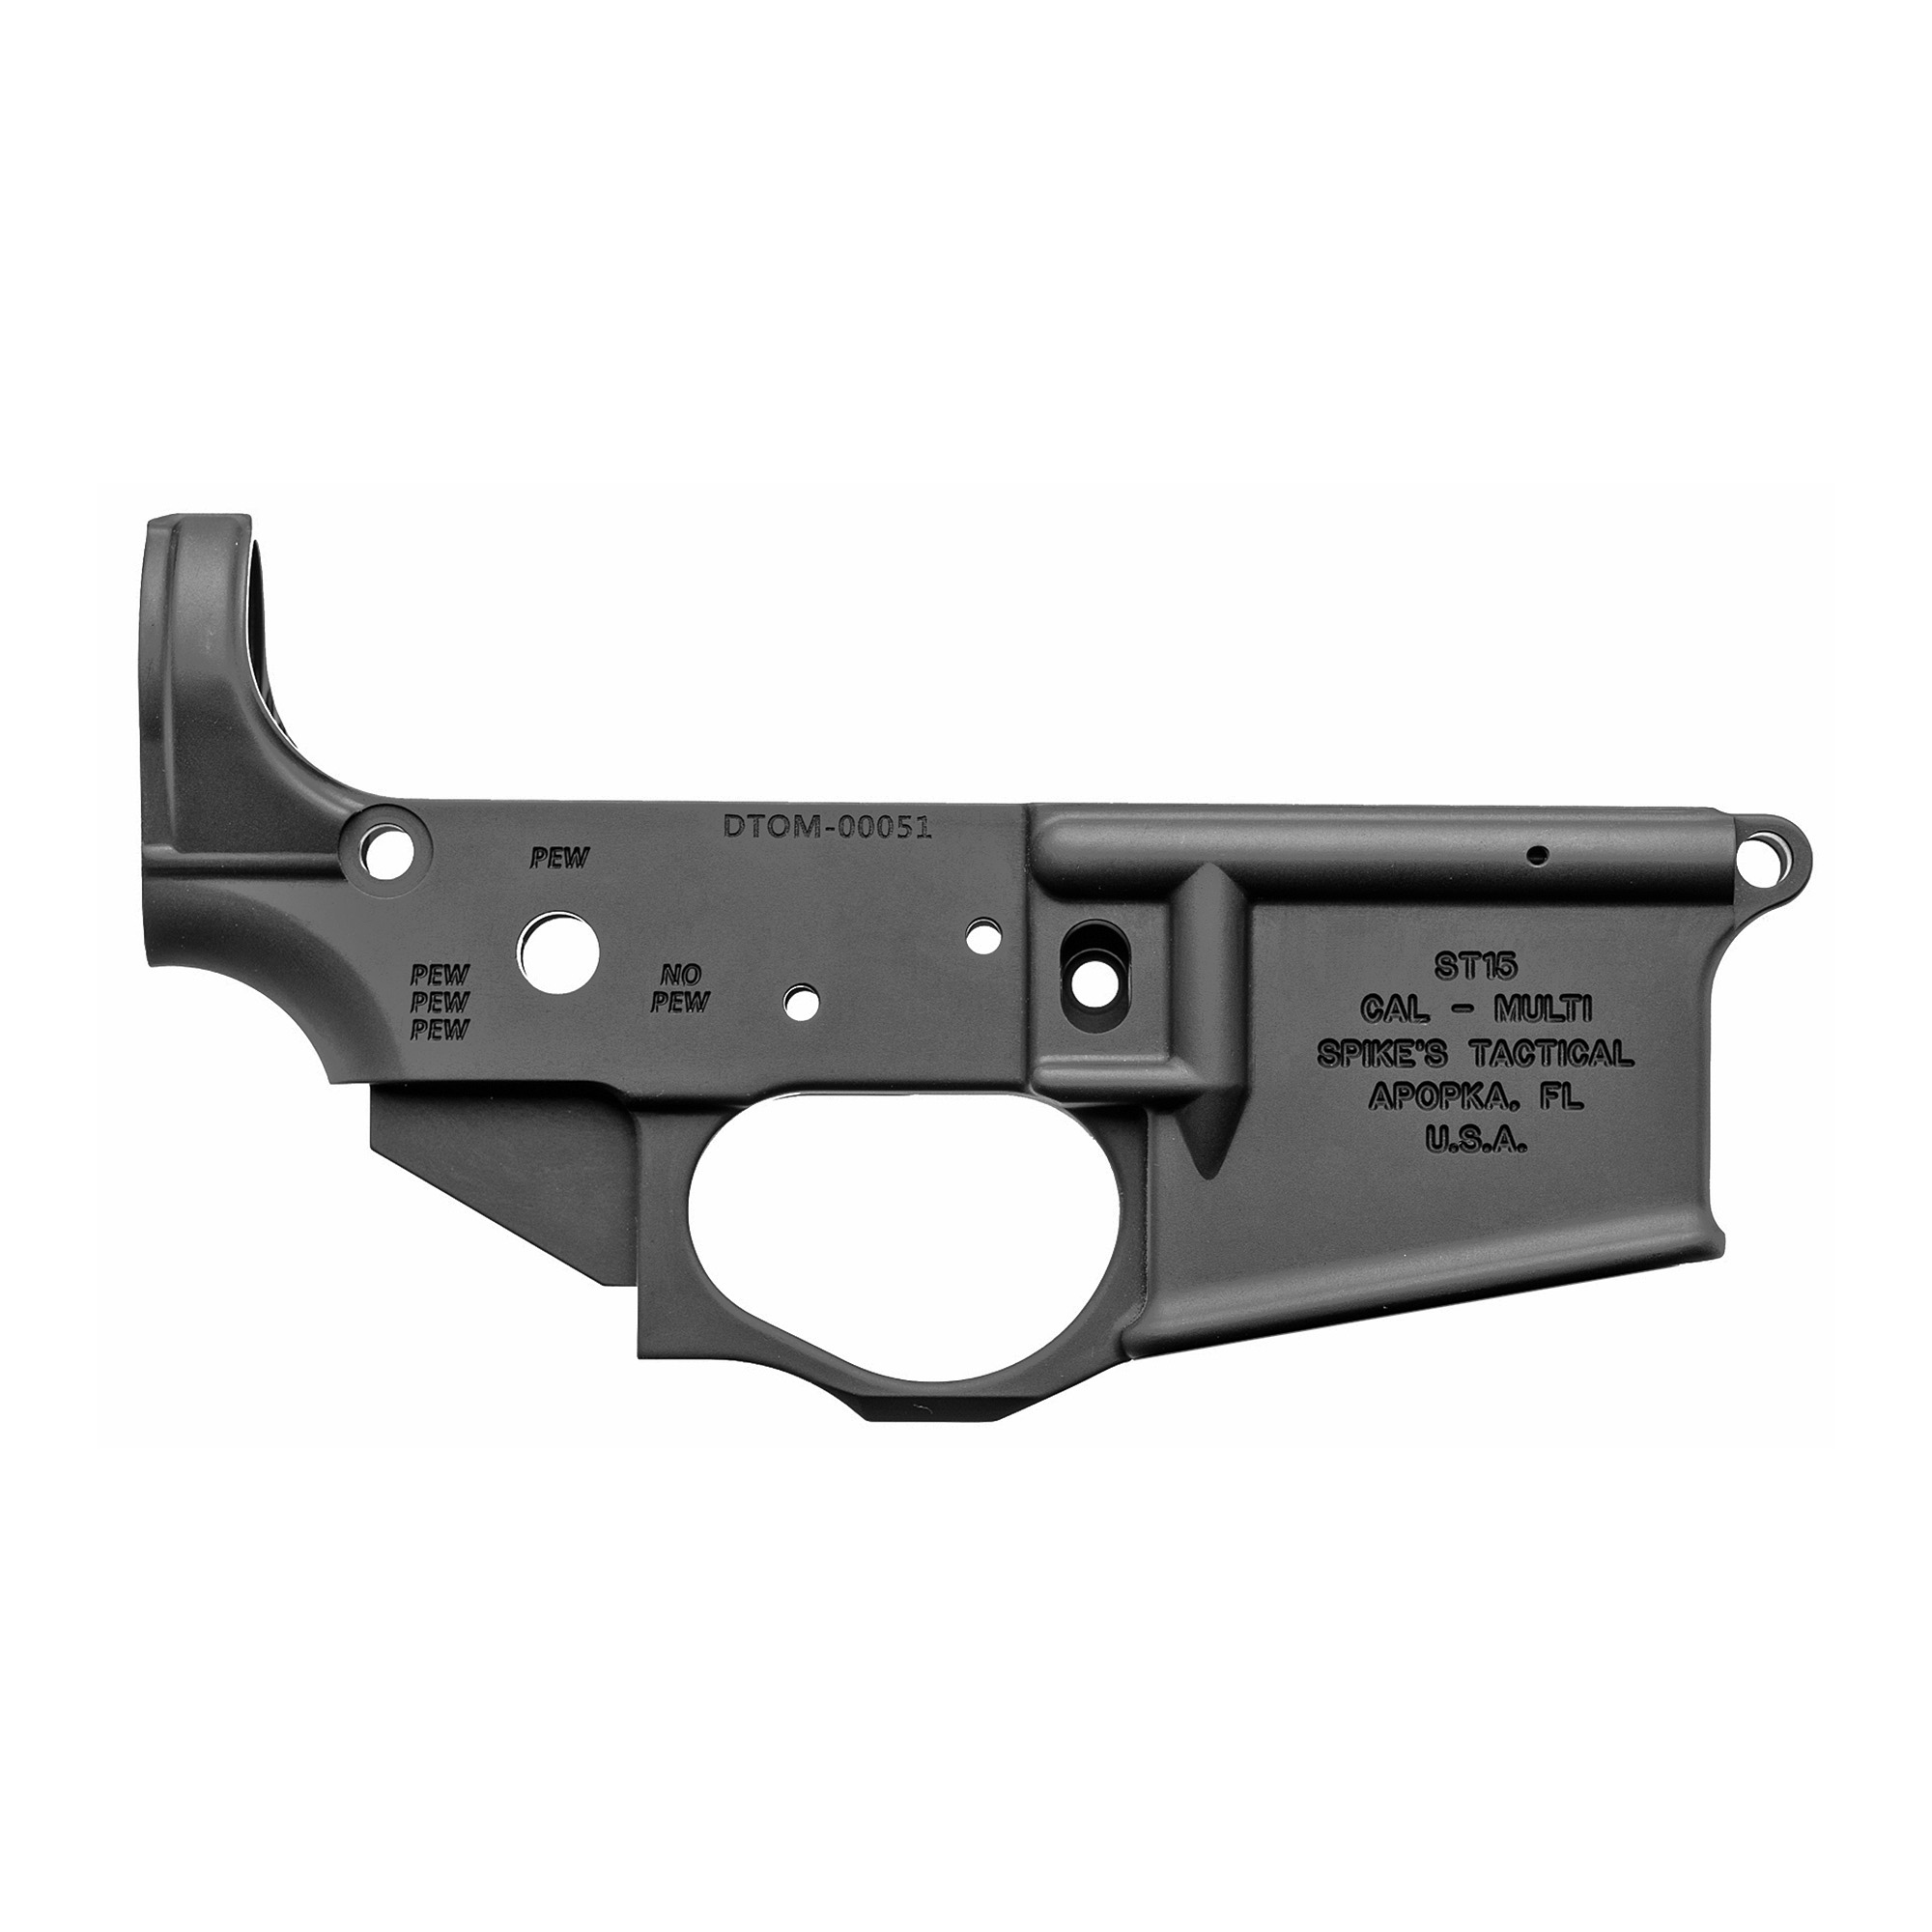 Spike's Tactical Gadsden Flag AR15 Stripped Lower Receiver · DK Firearms